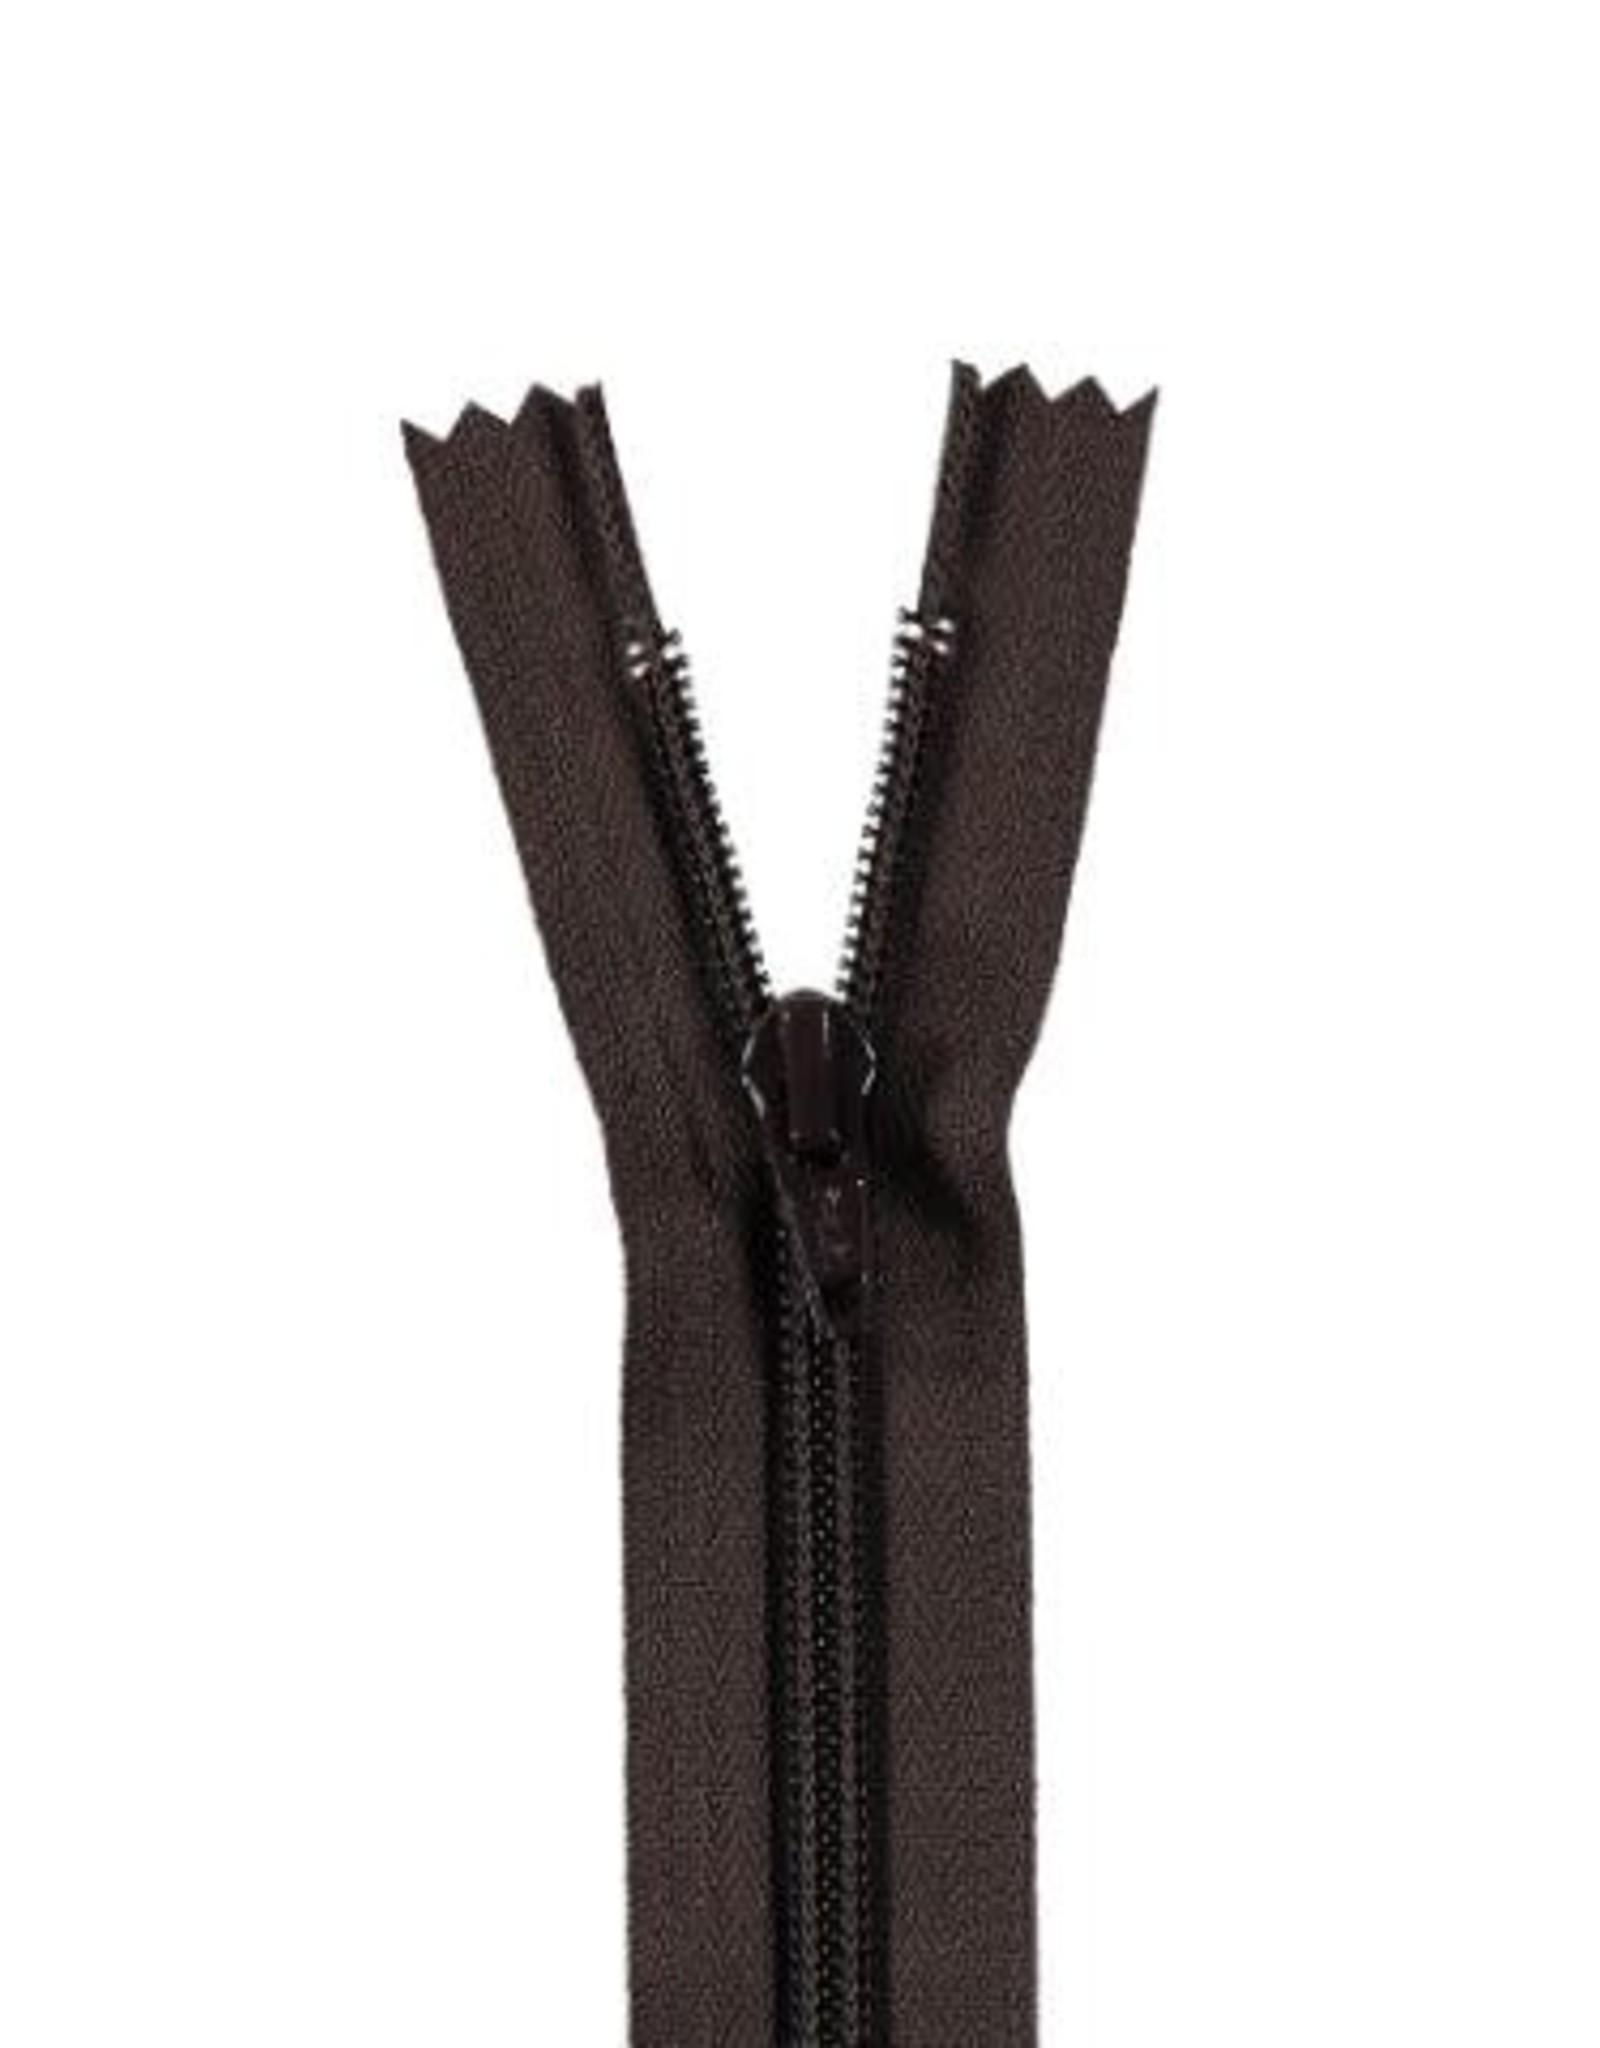 YKK Spiraalrits niet-DB 3mm donker bruin 570-20cm